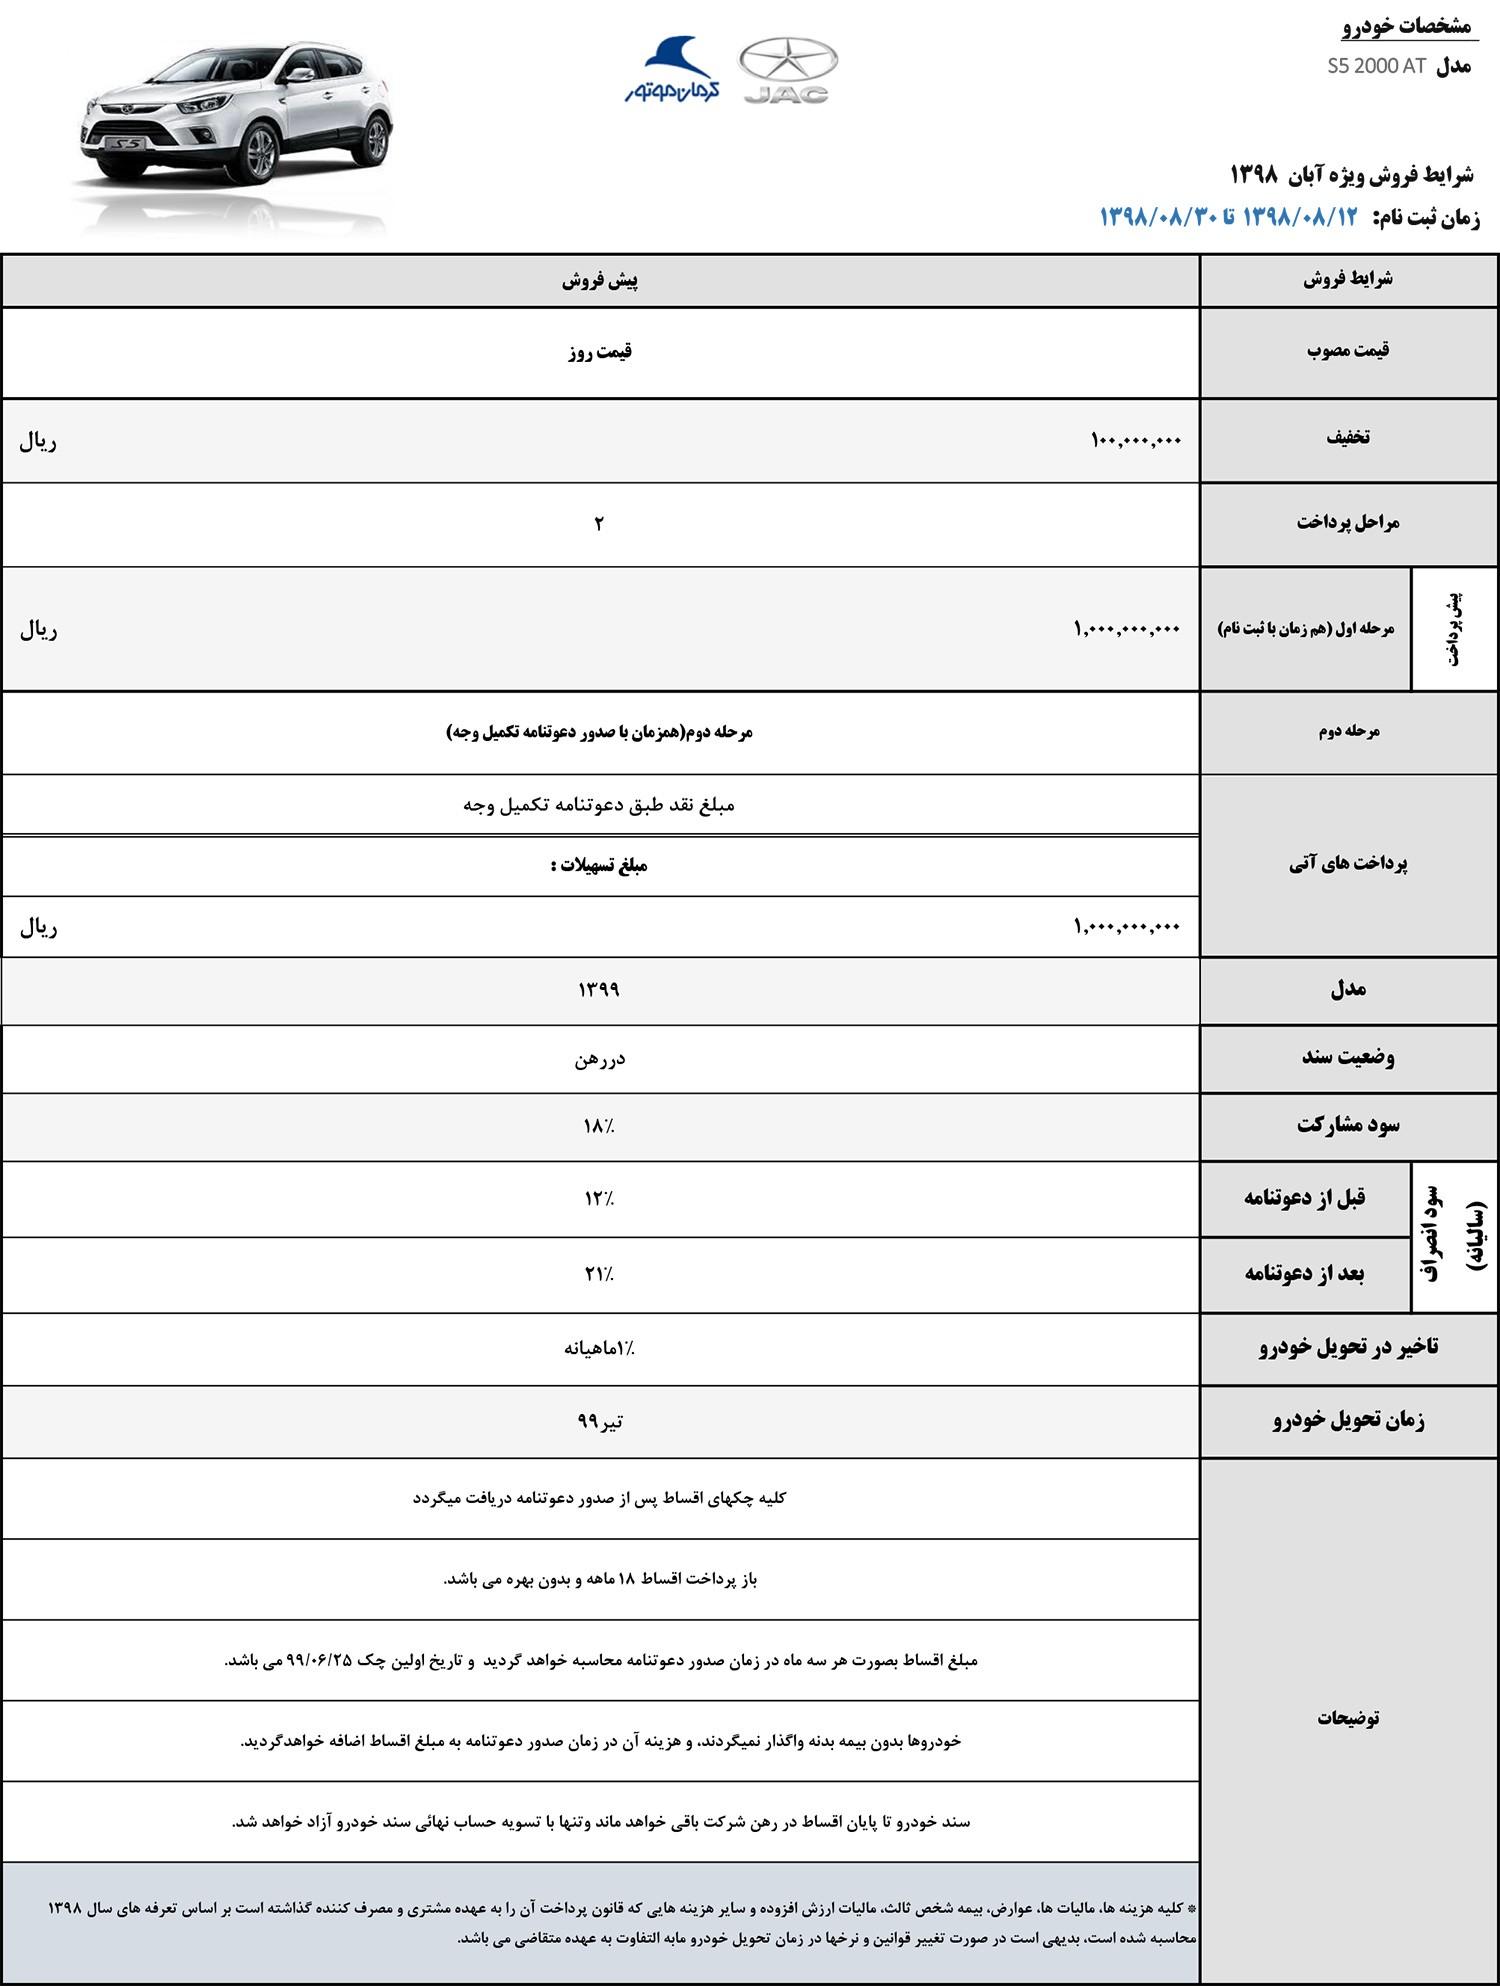 پيش فروش قيمت غير قطعي جک S5 اتوماتیک - آبان ماه 98